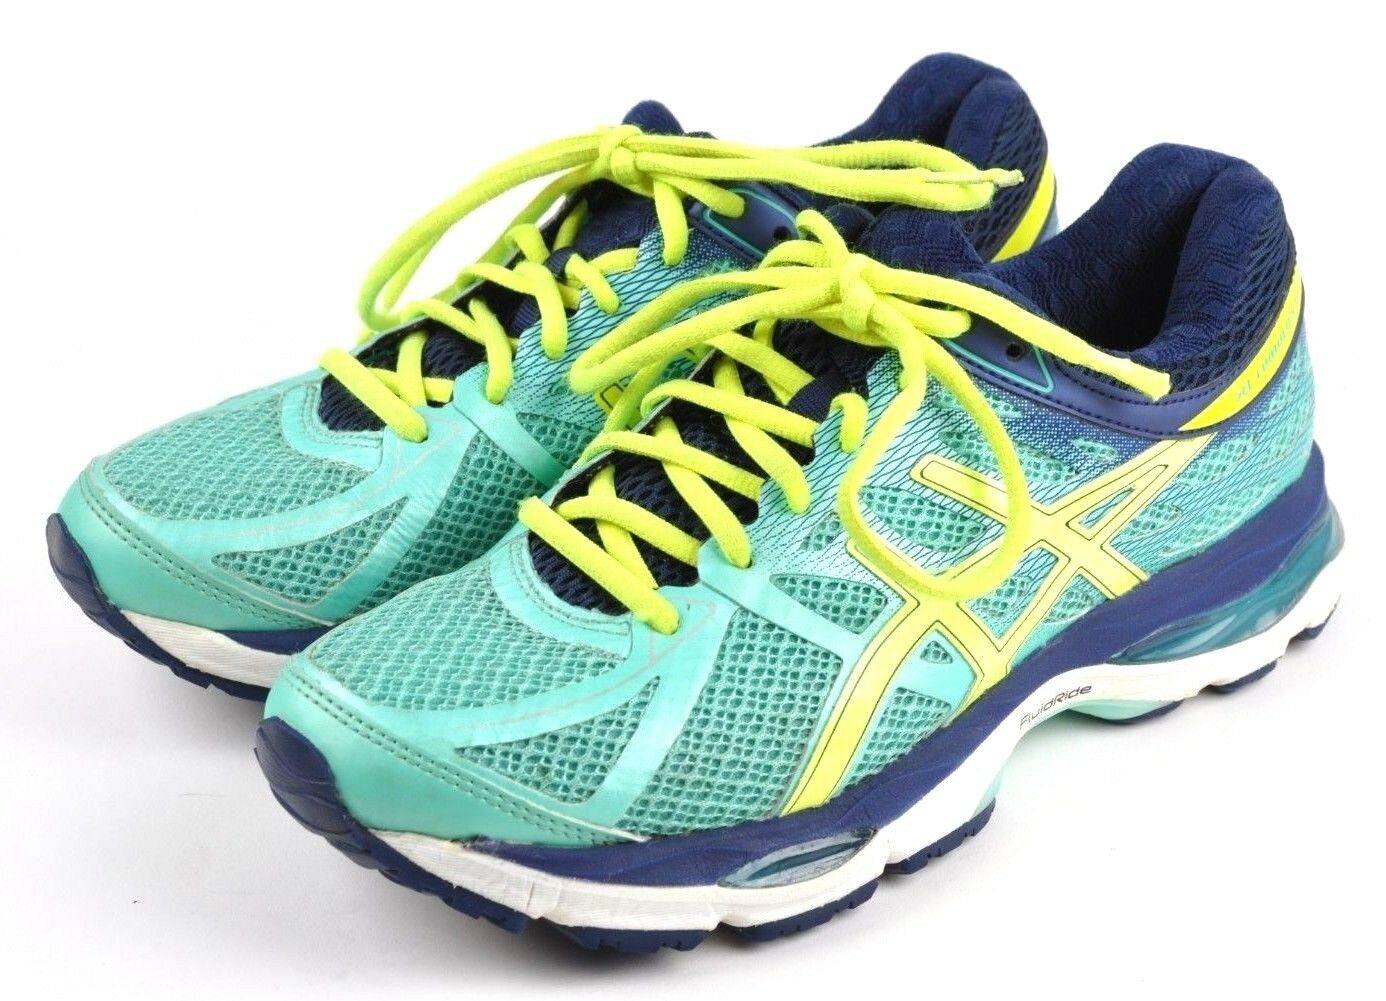 Asics Gel Cumulus 17 Aqua Mint Flash Yellow Navy Running shoes, Womens US 7.5 2A